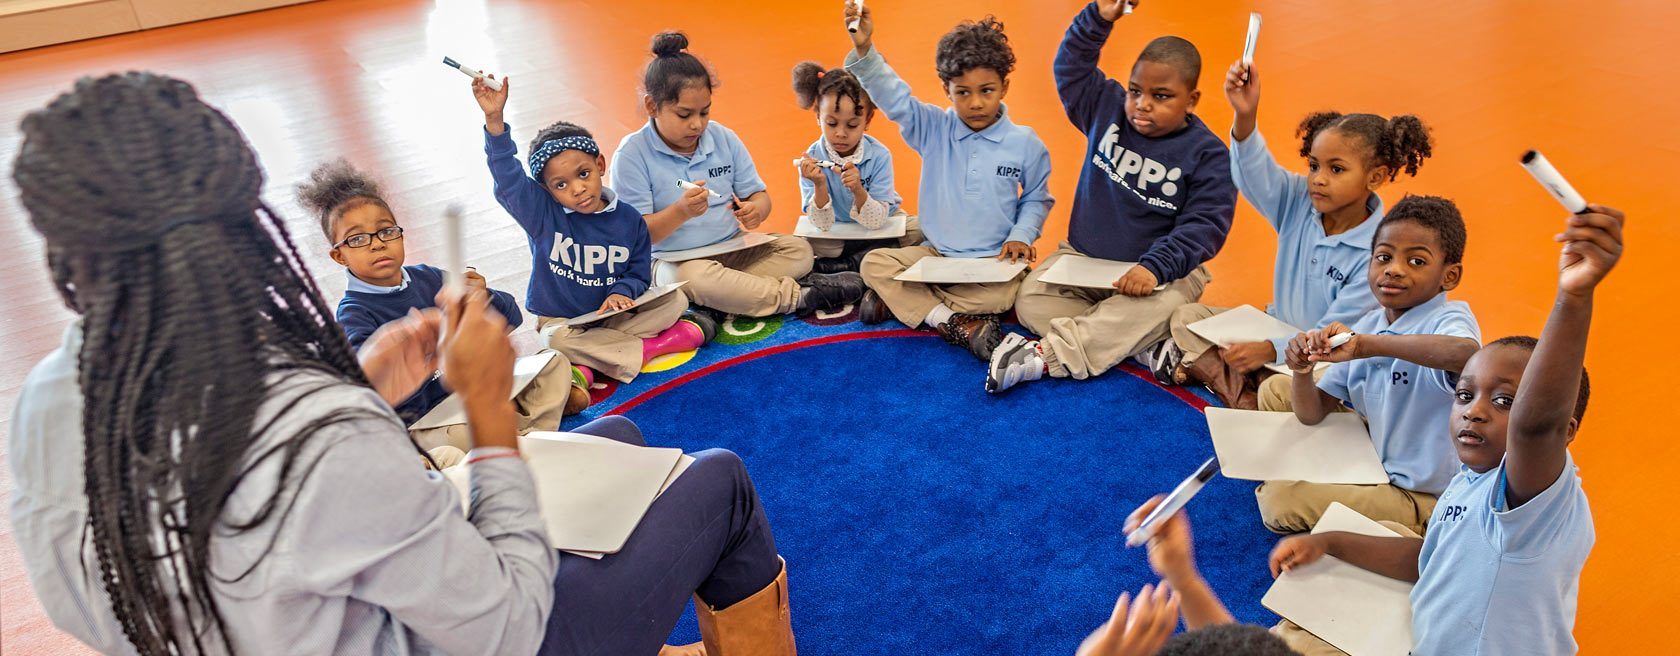 KIPP Classroom